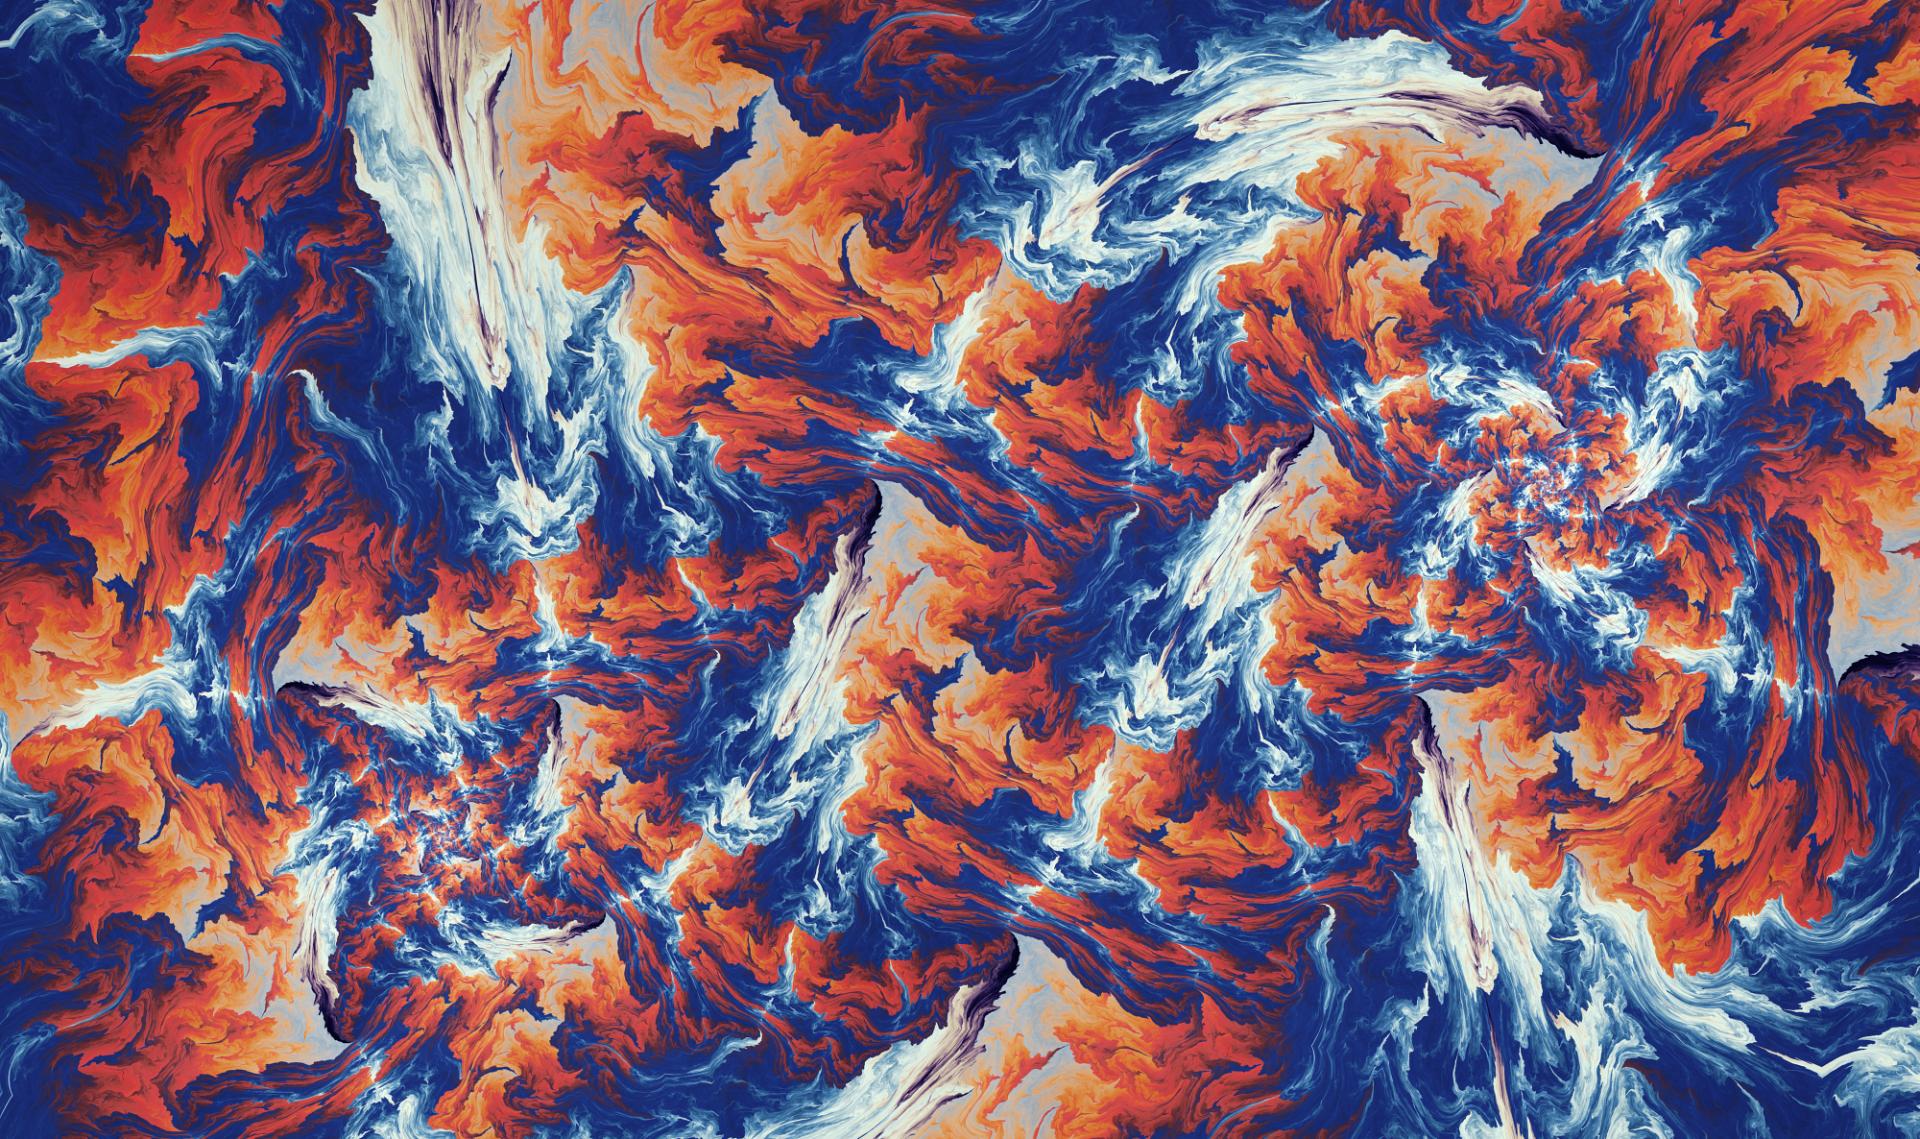 Abstract - Fractal  Smoke Artistic Wallpaper